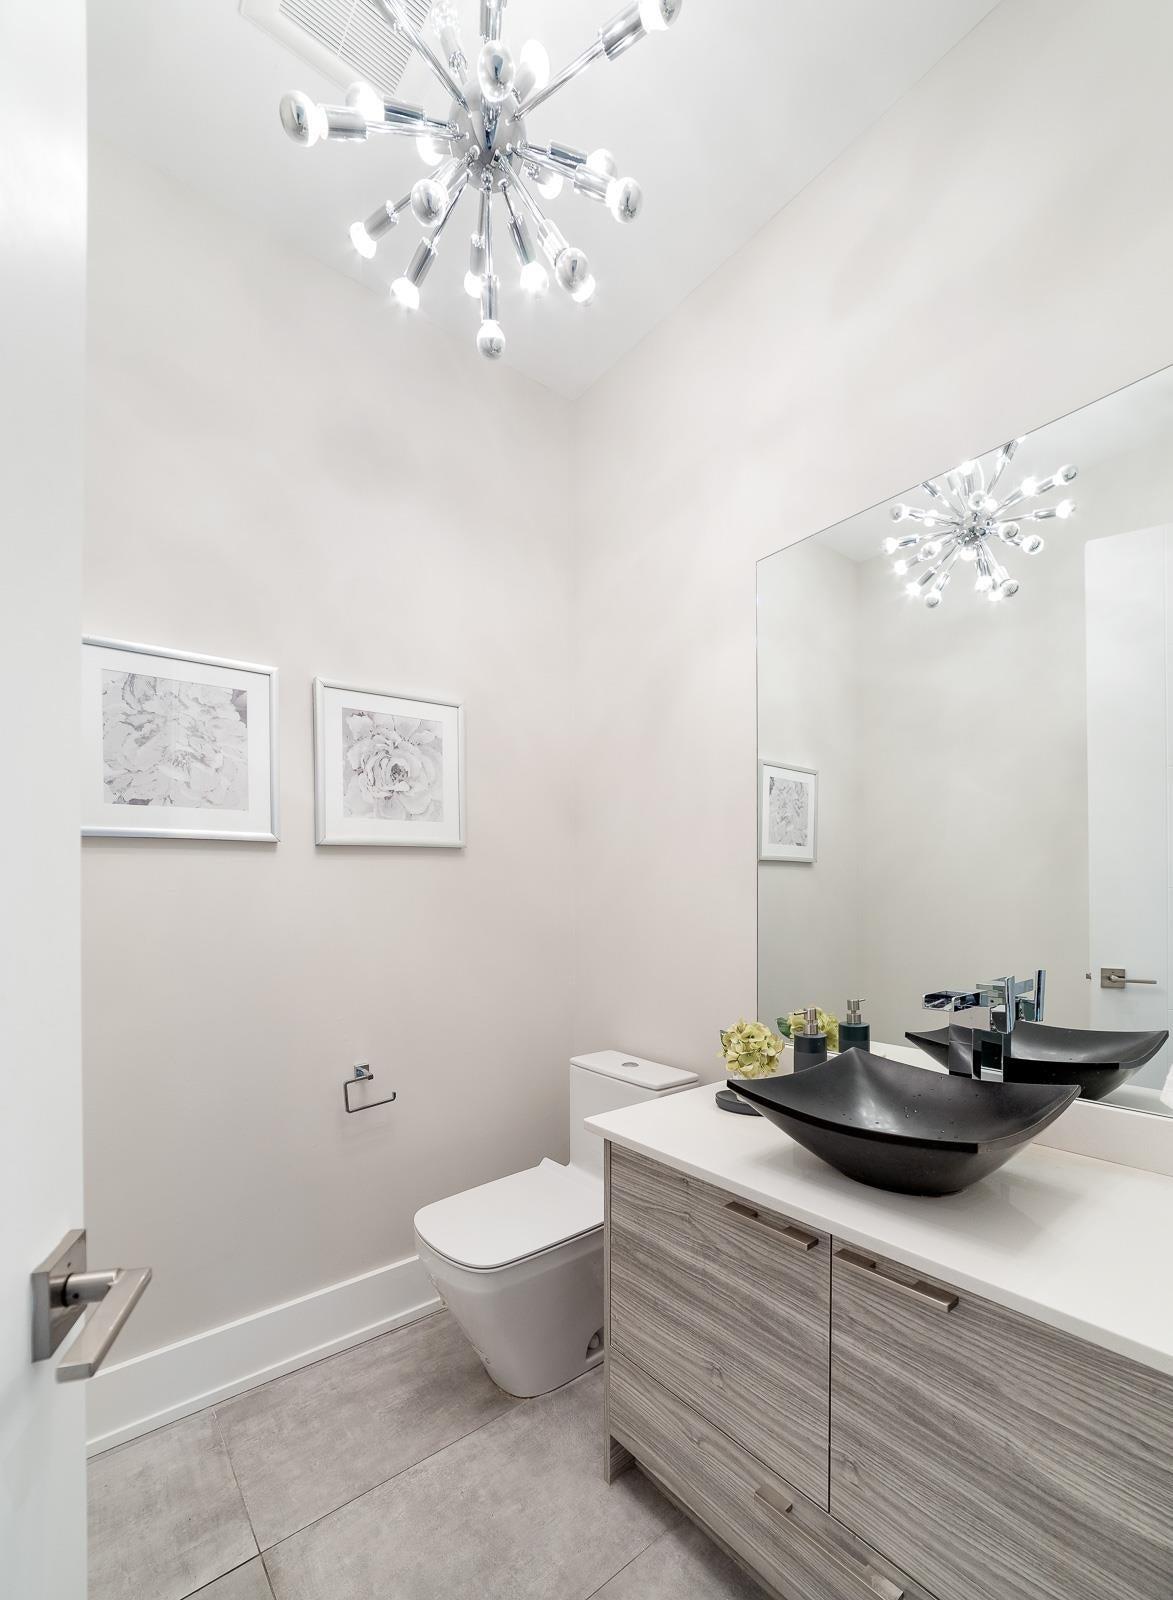 517 GRANADA CRESCENT - Upper Delbrook House/Single Family for sale, 8 Bedrooms (R2615057) - #12